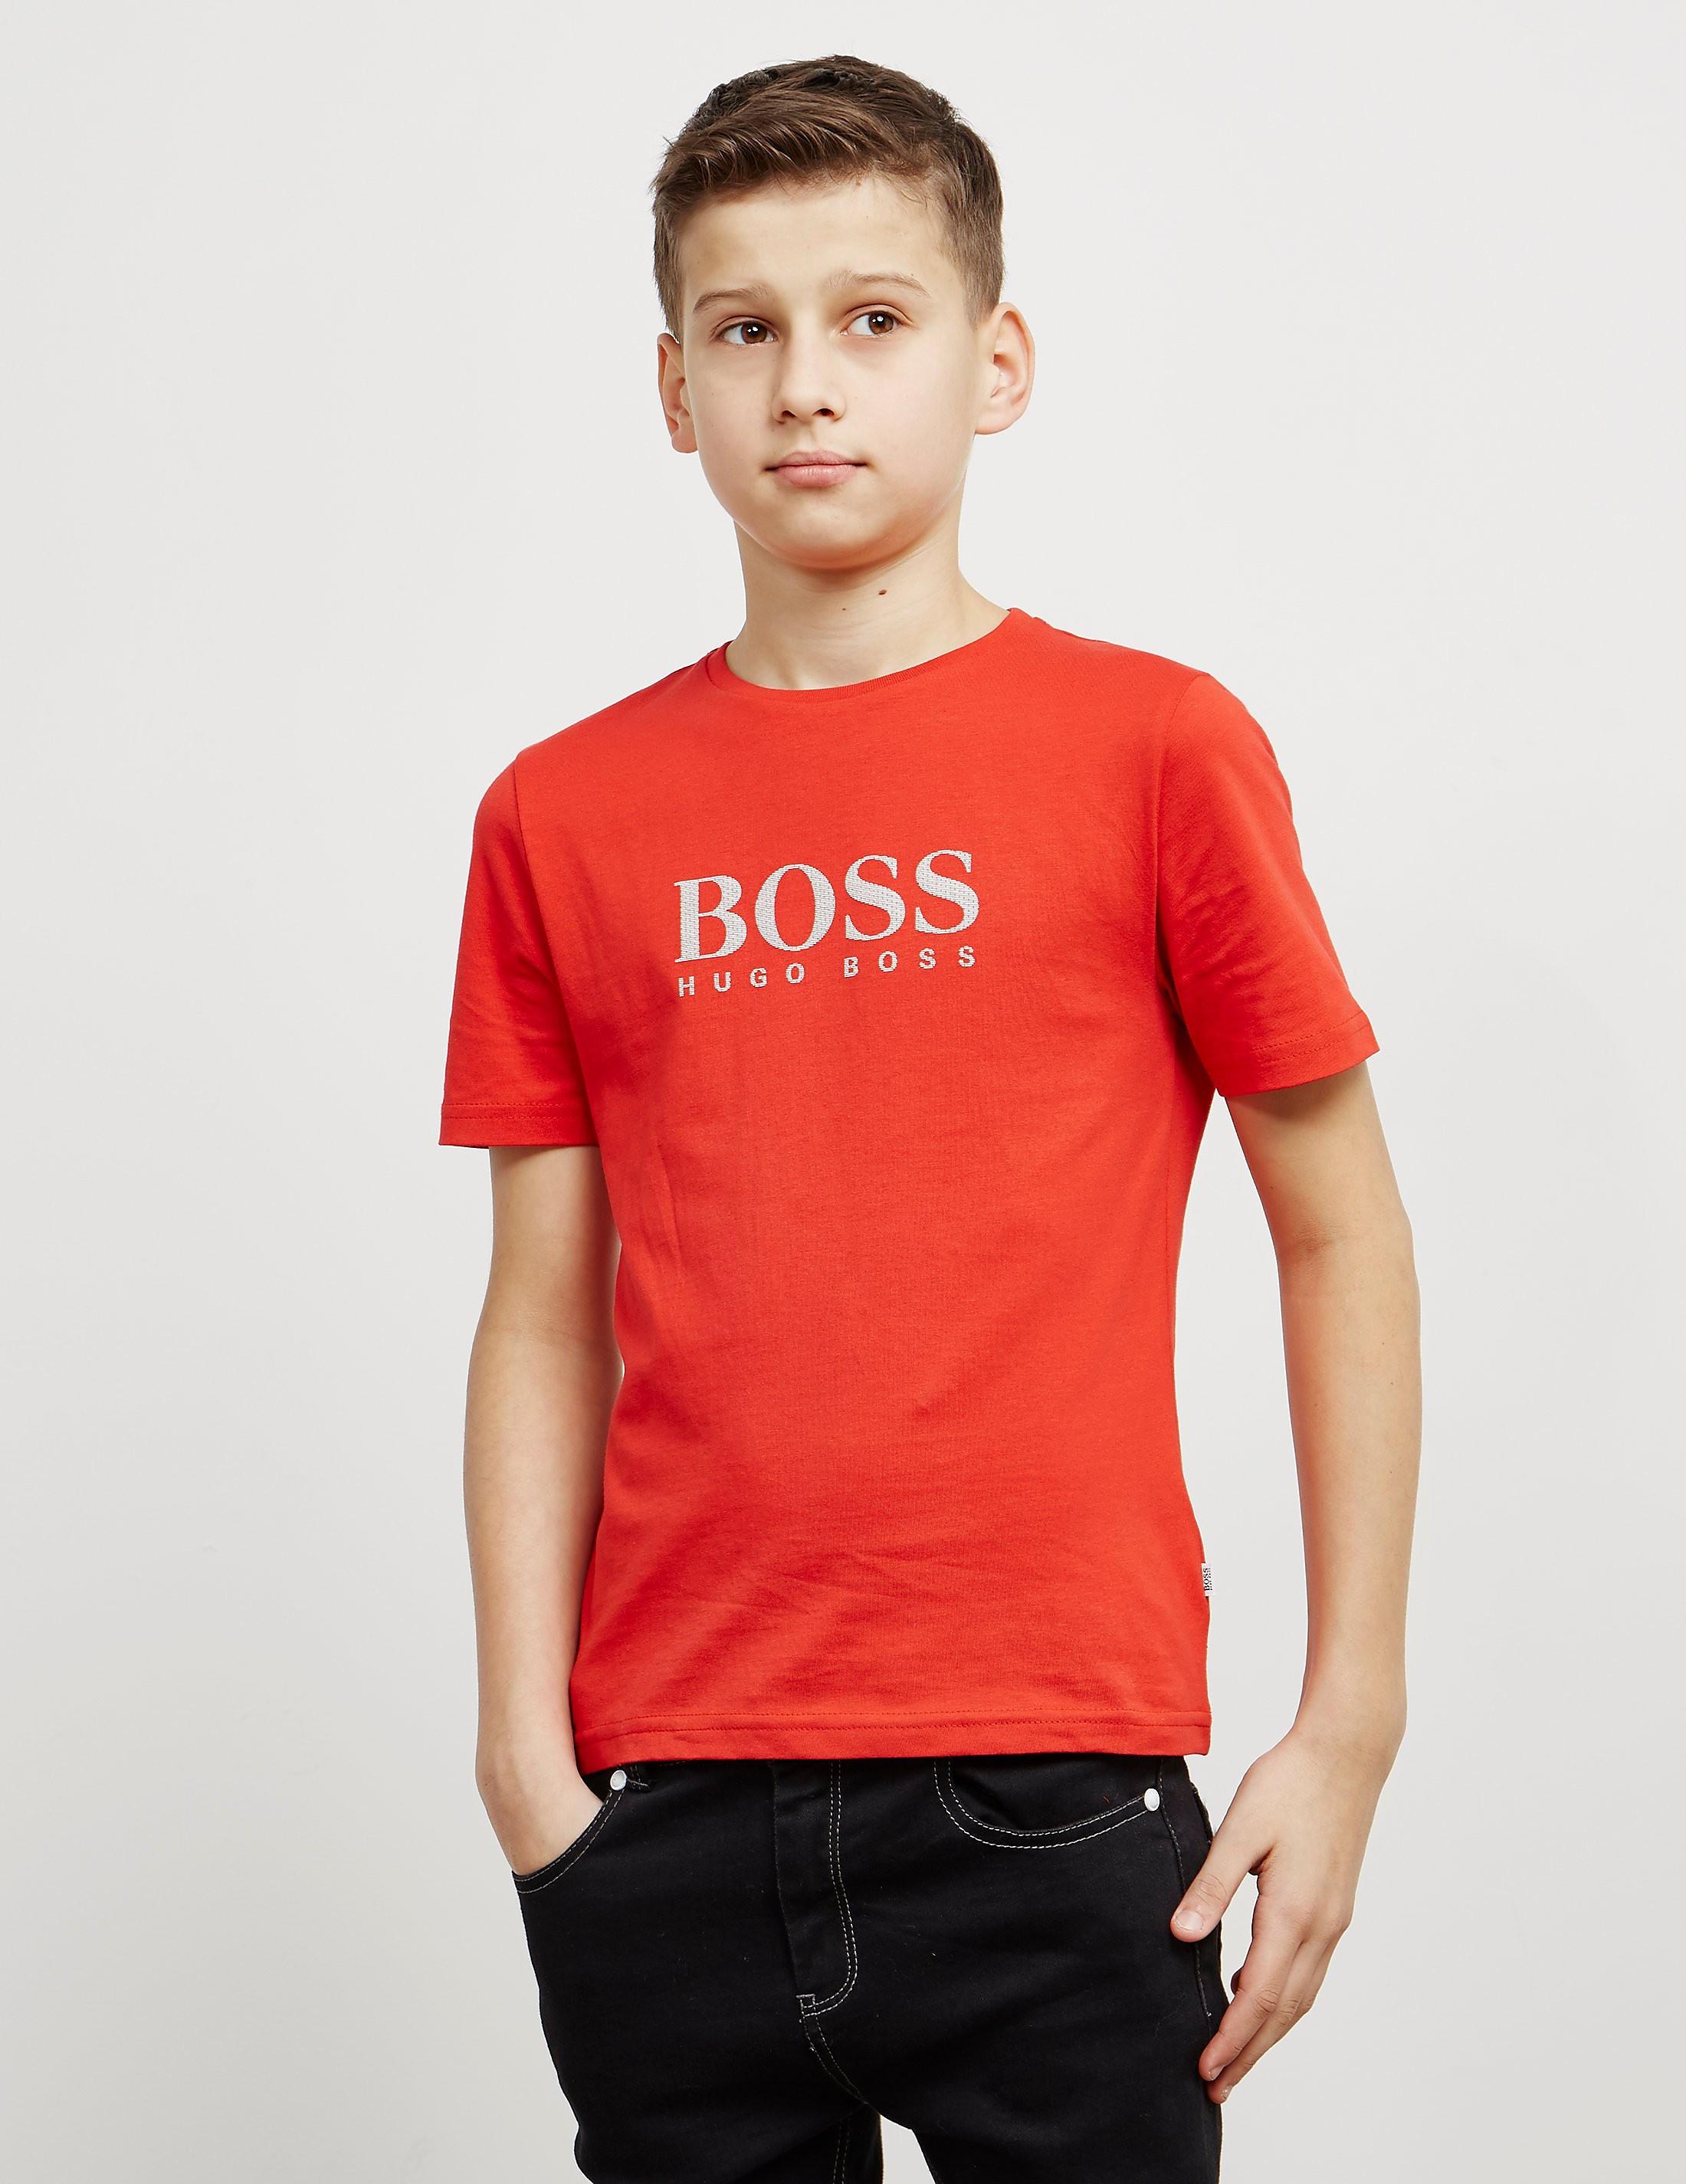 BOSS Large Logo Short Sleeve T-Shirt